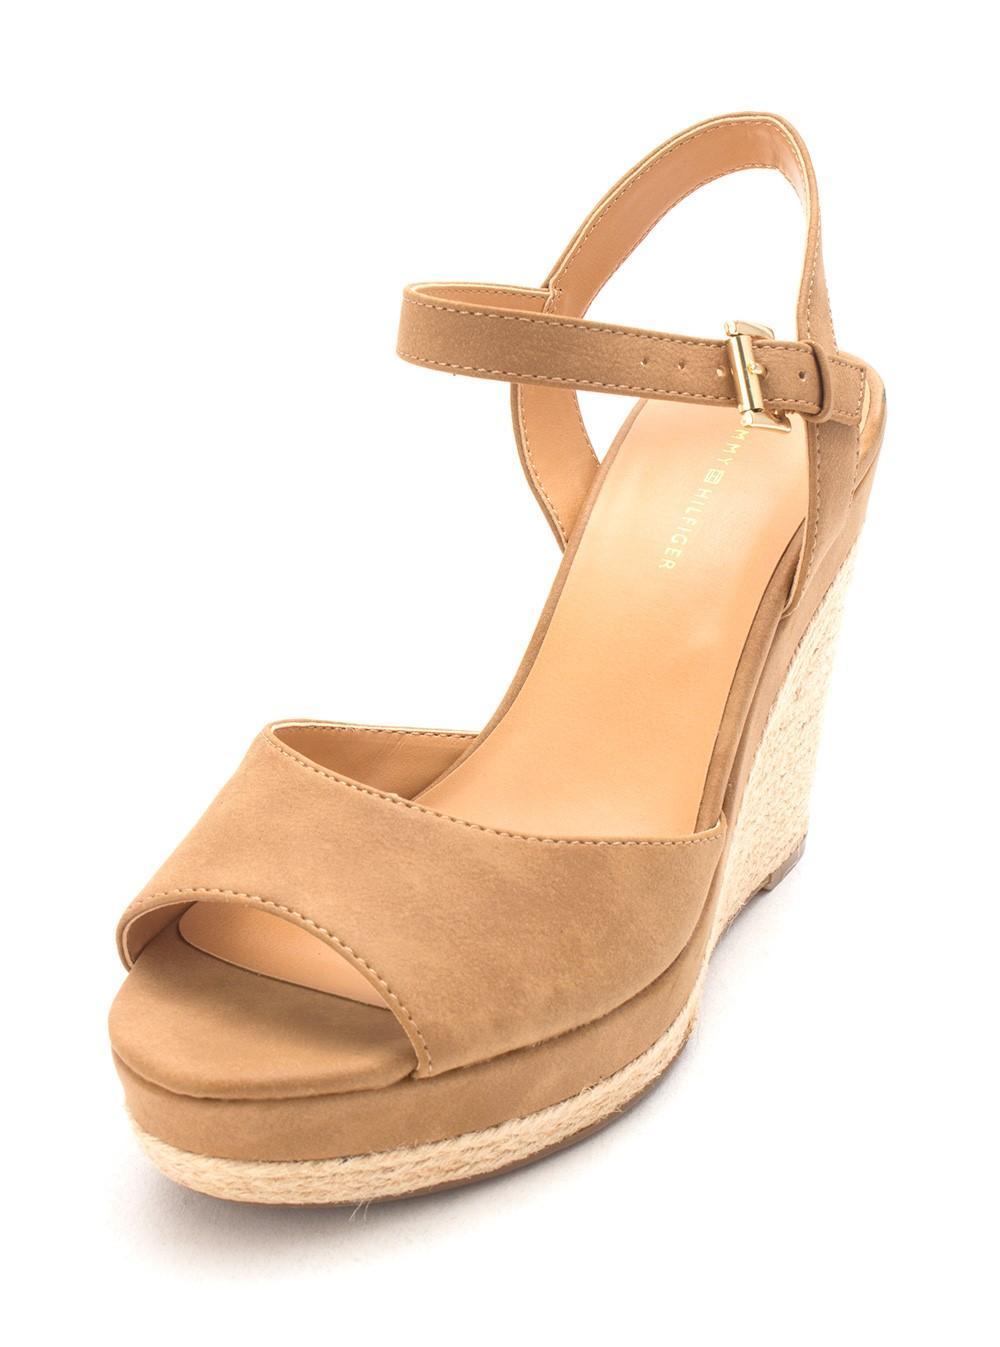 1c9d68ad Tommy Hilfiger - Brown Kali2 Peep Toe Wedge Sandals, Medium - Lyst. View  fullscreen